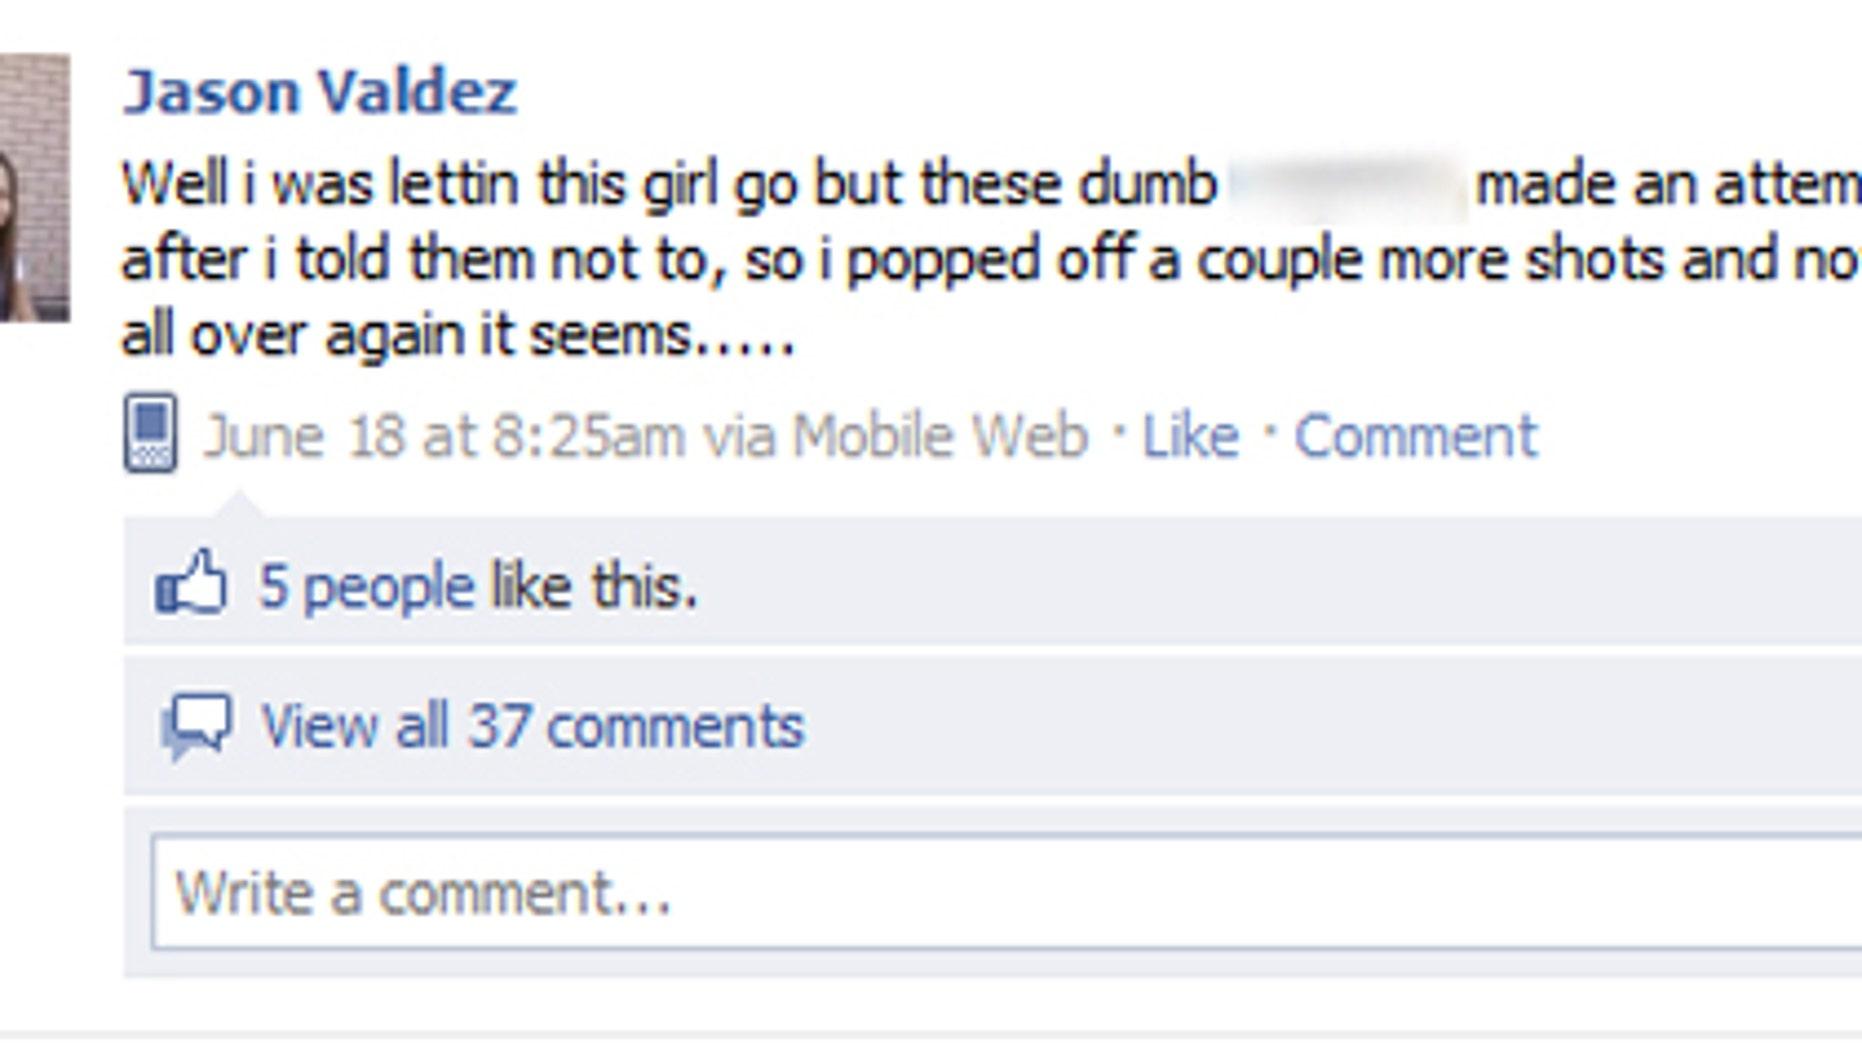 June 18: Jason Valdez's Facebook update